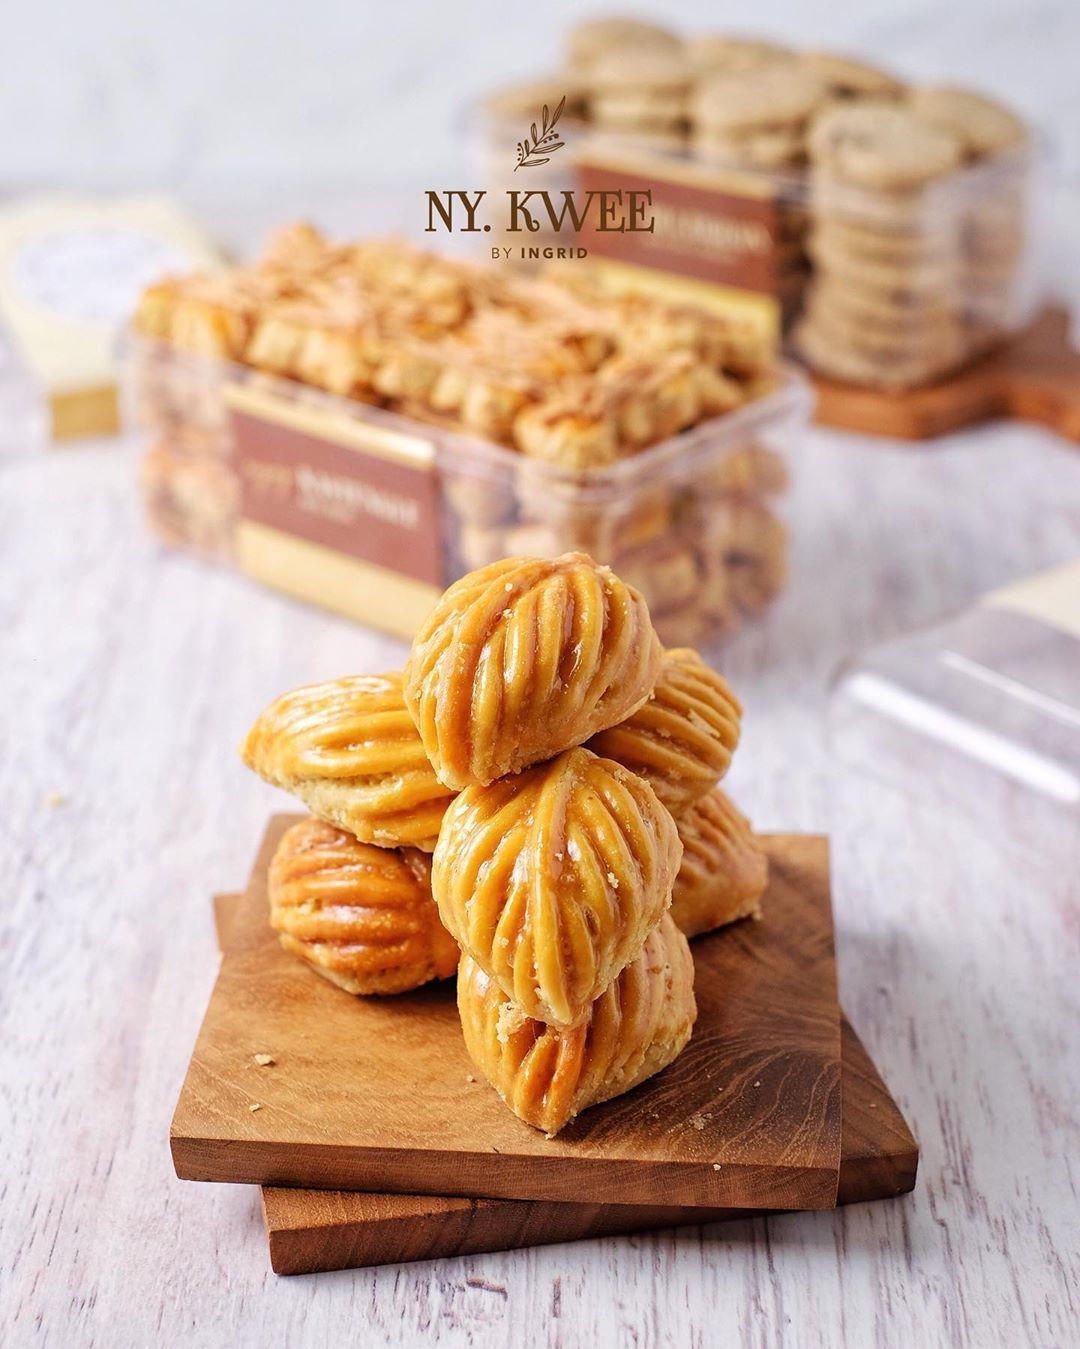 Yang Tercantik Diantara Deretan Kue Kering Ny Kwee By Ingrid Nih Nastar Daun Yang Selalu Bikin Penasaran Setiap Orang Fotografi Makanan Ide Makanan Makanan